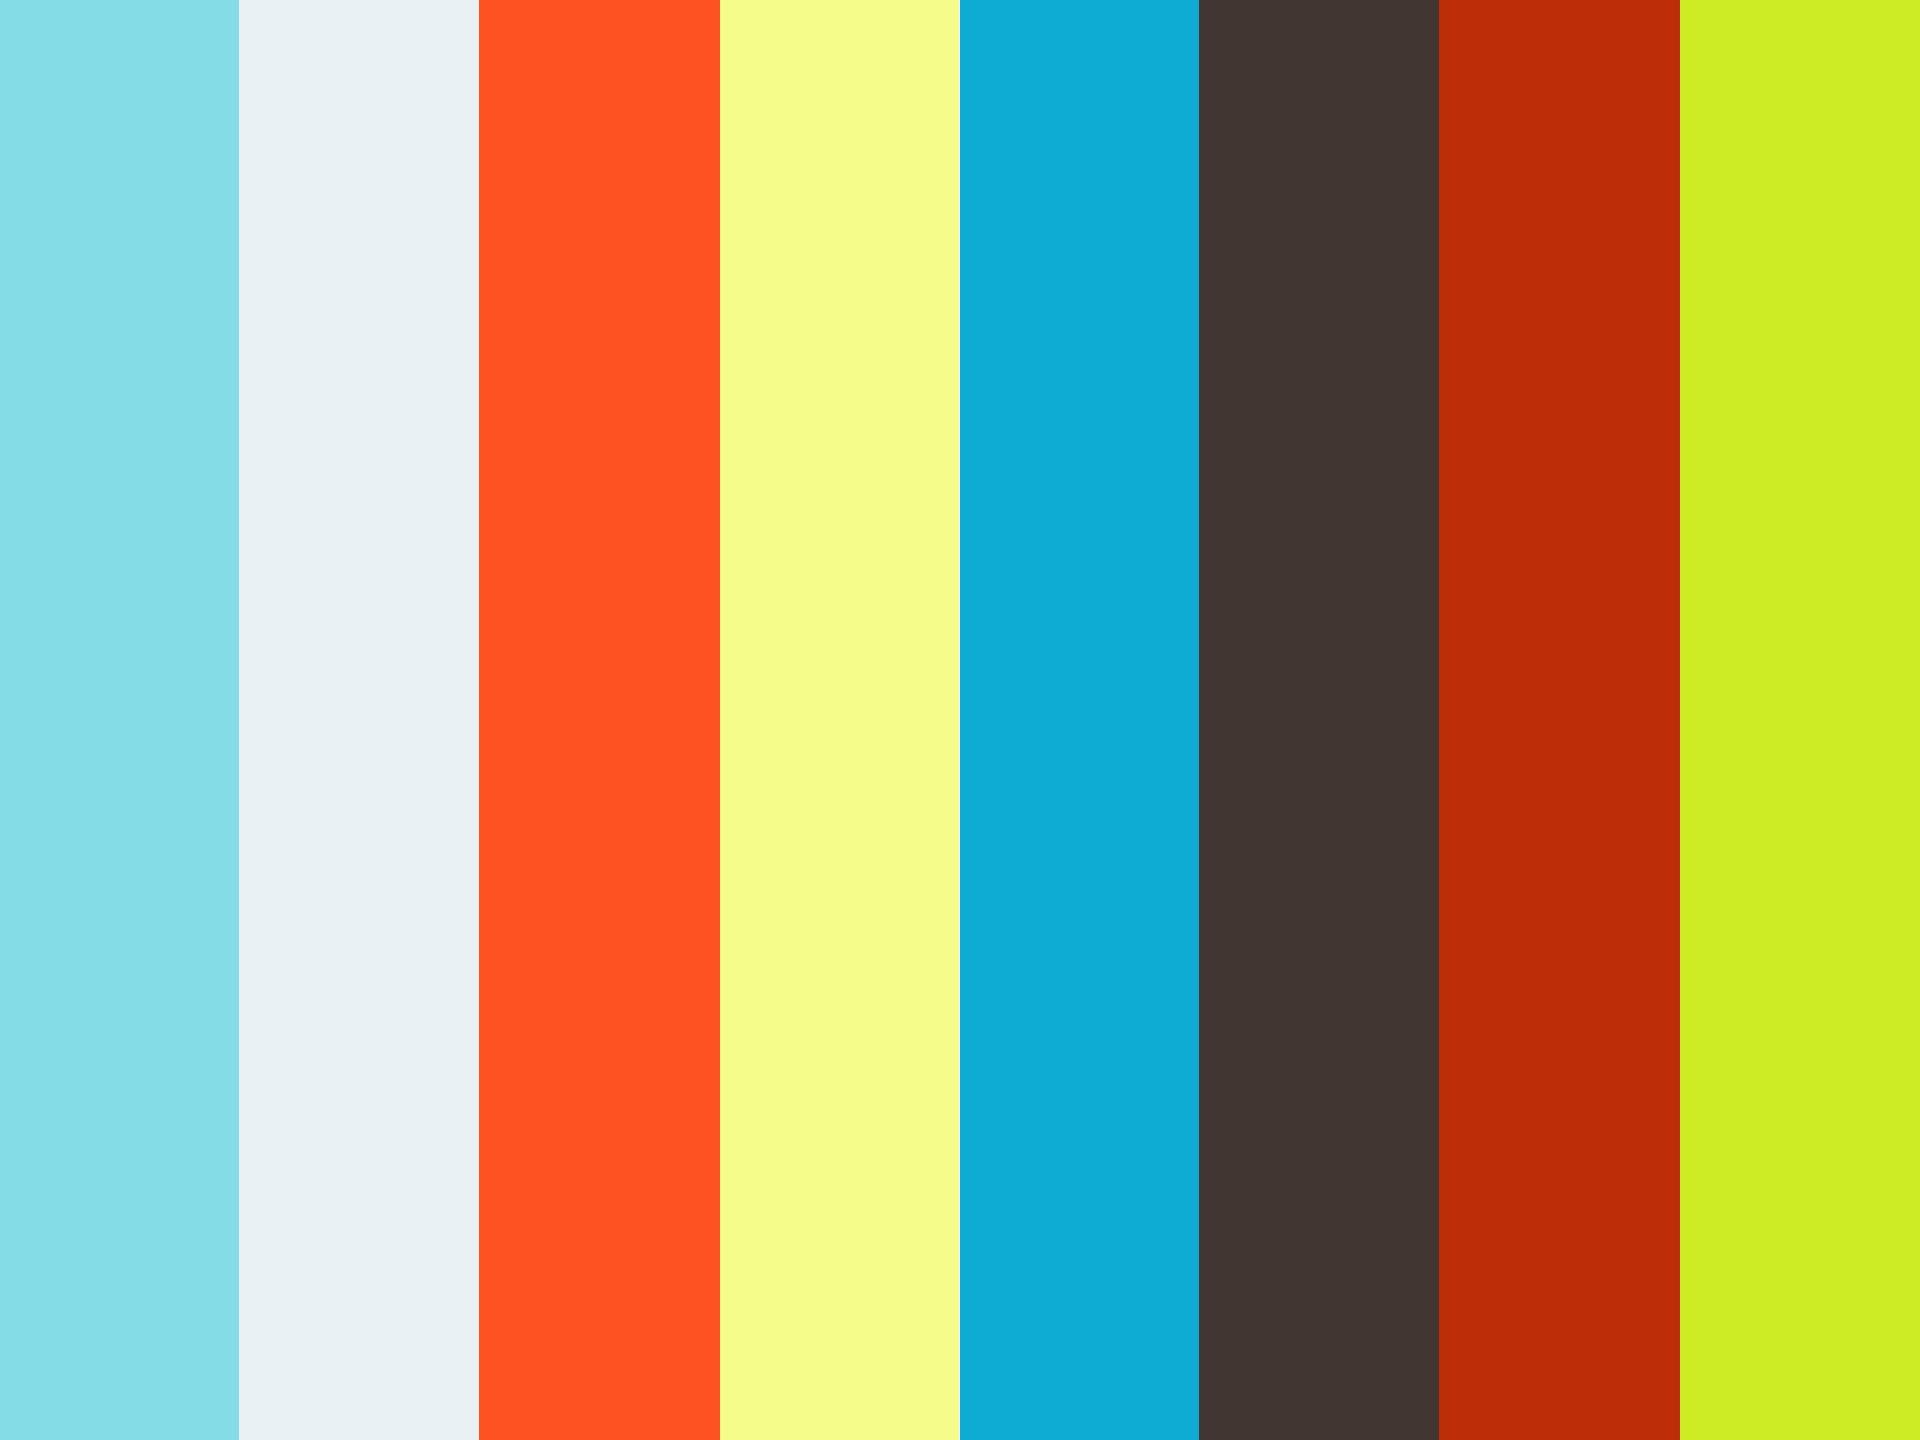 autumn dial wikipediaautumn dial instagram, autumn dial age, autumn dial the walking dead, autumn dial wikipedia, autumn dial, autumn dial wiki, autumn dial bio, autumn dial twitter, autumn dial feet, autumn dial hot, autumn dial birthdate, autumn dial premature, autumn dial karate, autumn dial nudography, autumn dial facebook, autumn dial height, autumn dial american reunion, autumn dial bikini, autumn dial vampire diaries